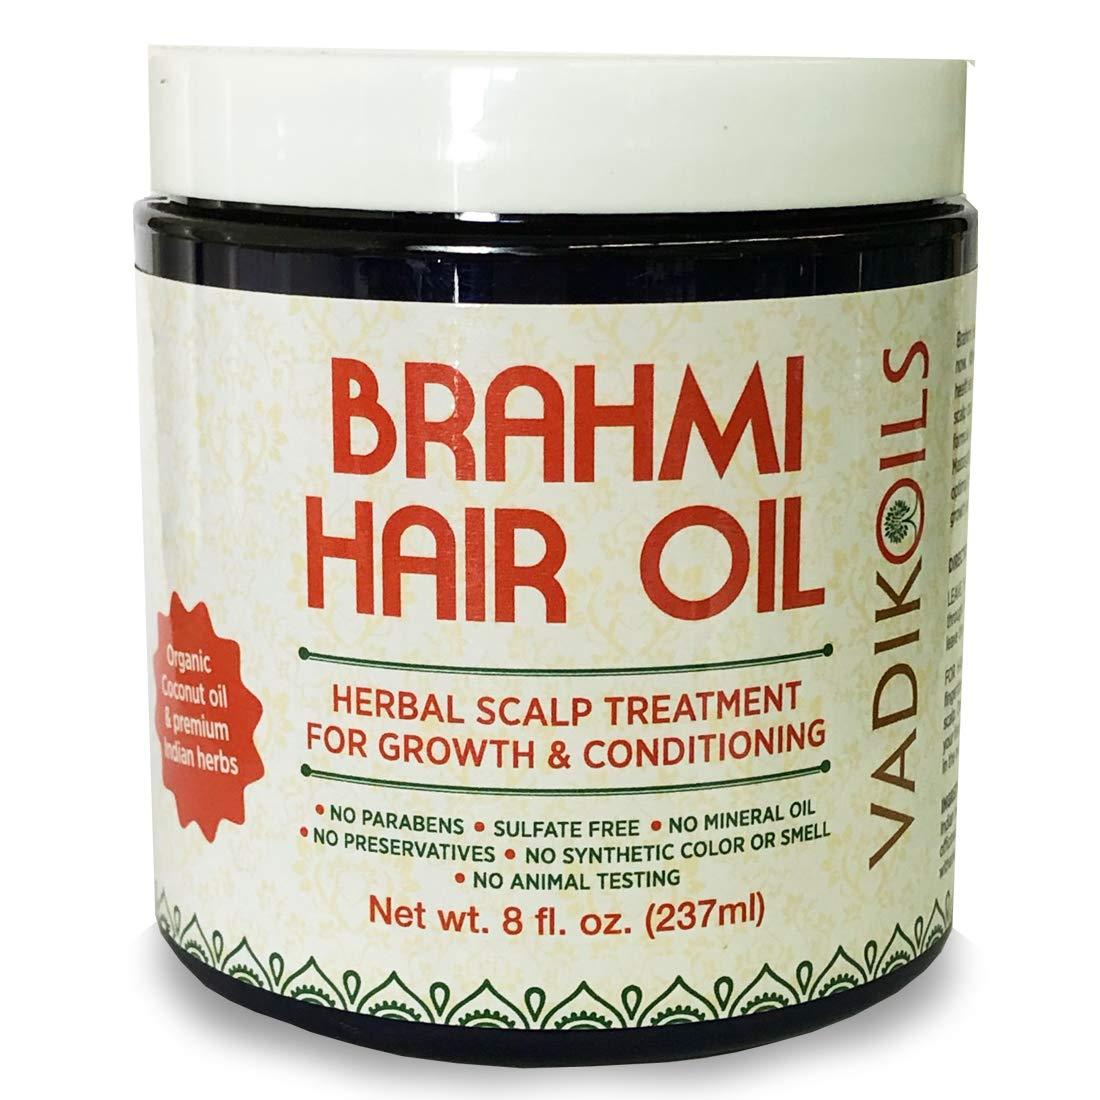 Brahmi Hair Oil (8 oz) by Vadik Herbs | All natural herbal hair oil for hair growth, hair conditioning, dandruff and dry scalp | Herbal scalp treatment by Vadik Herbs